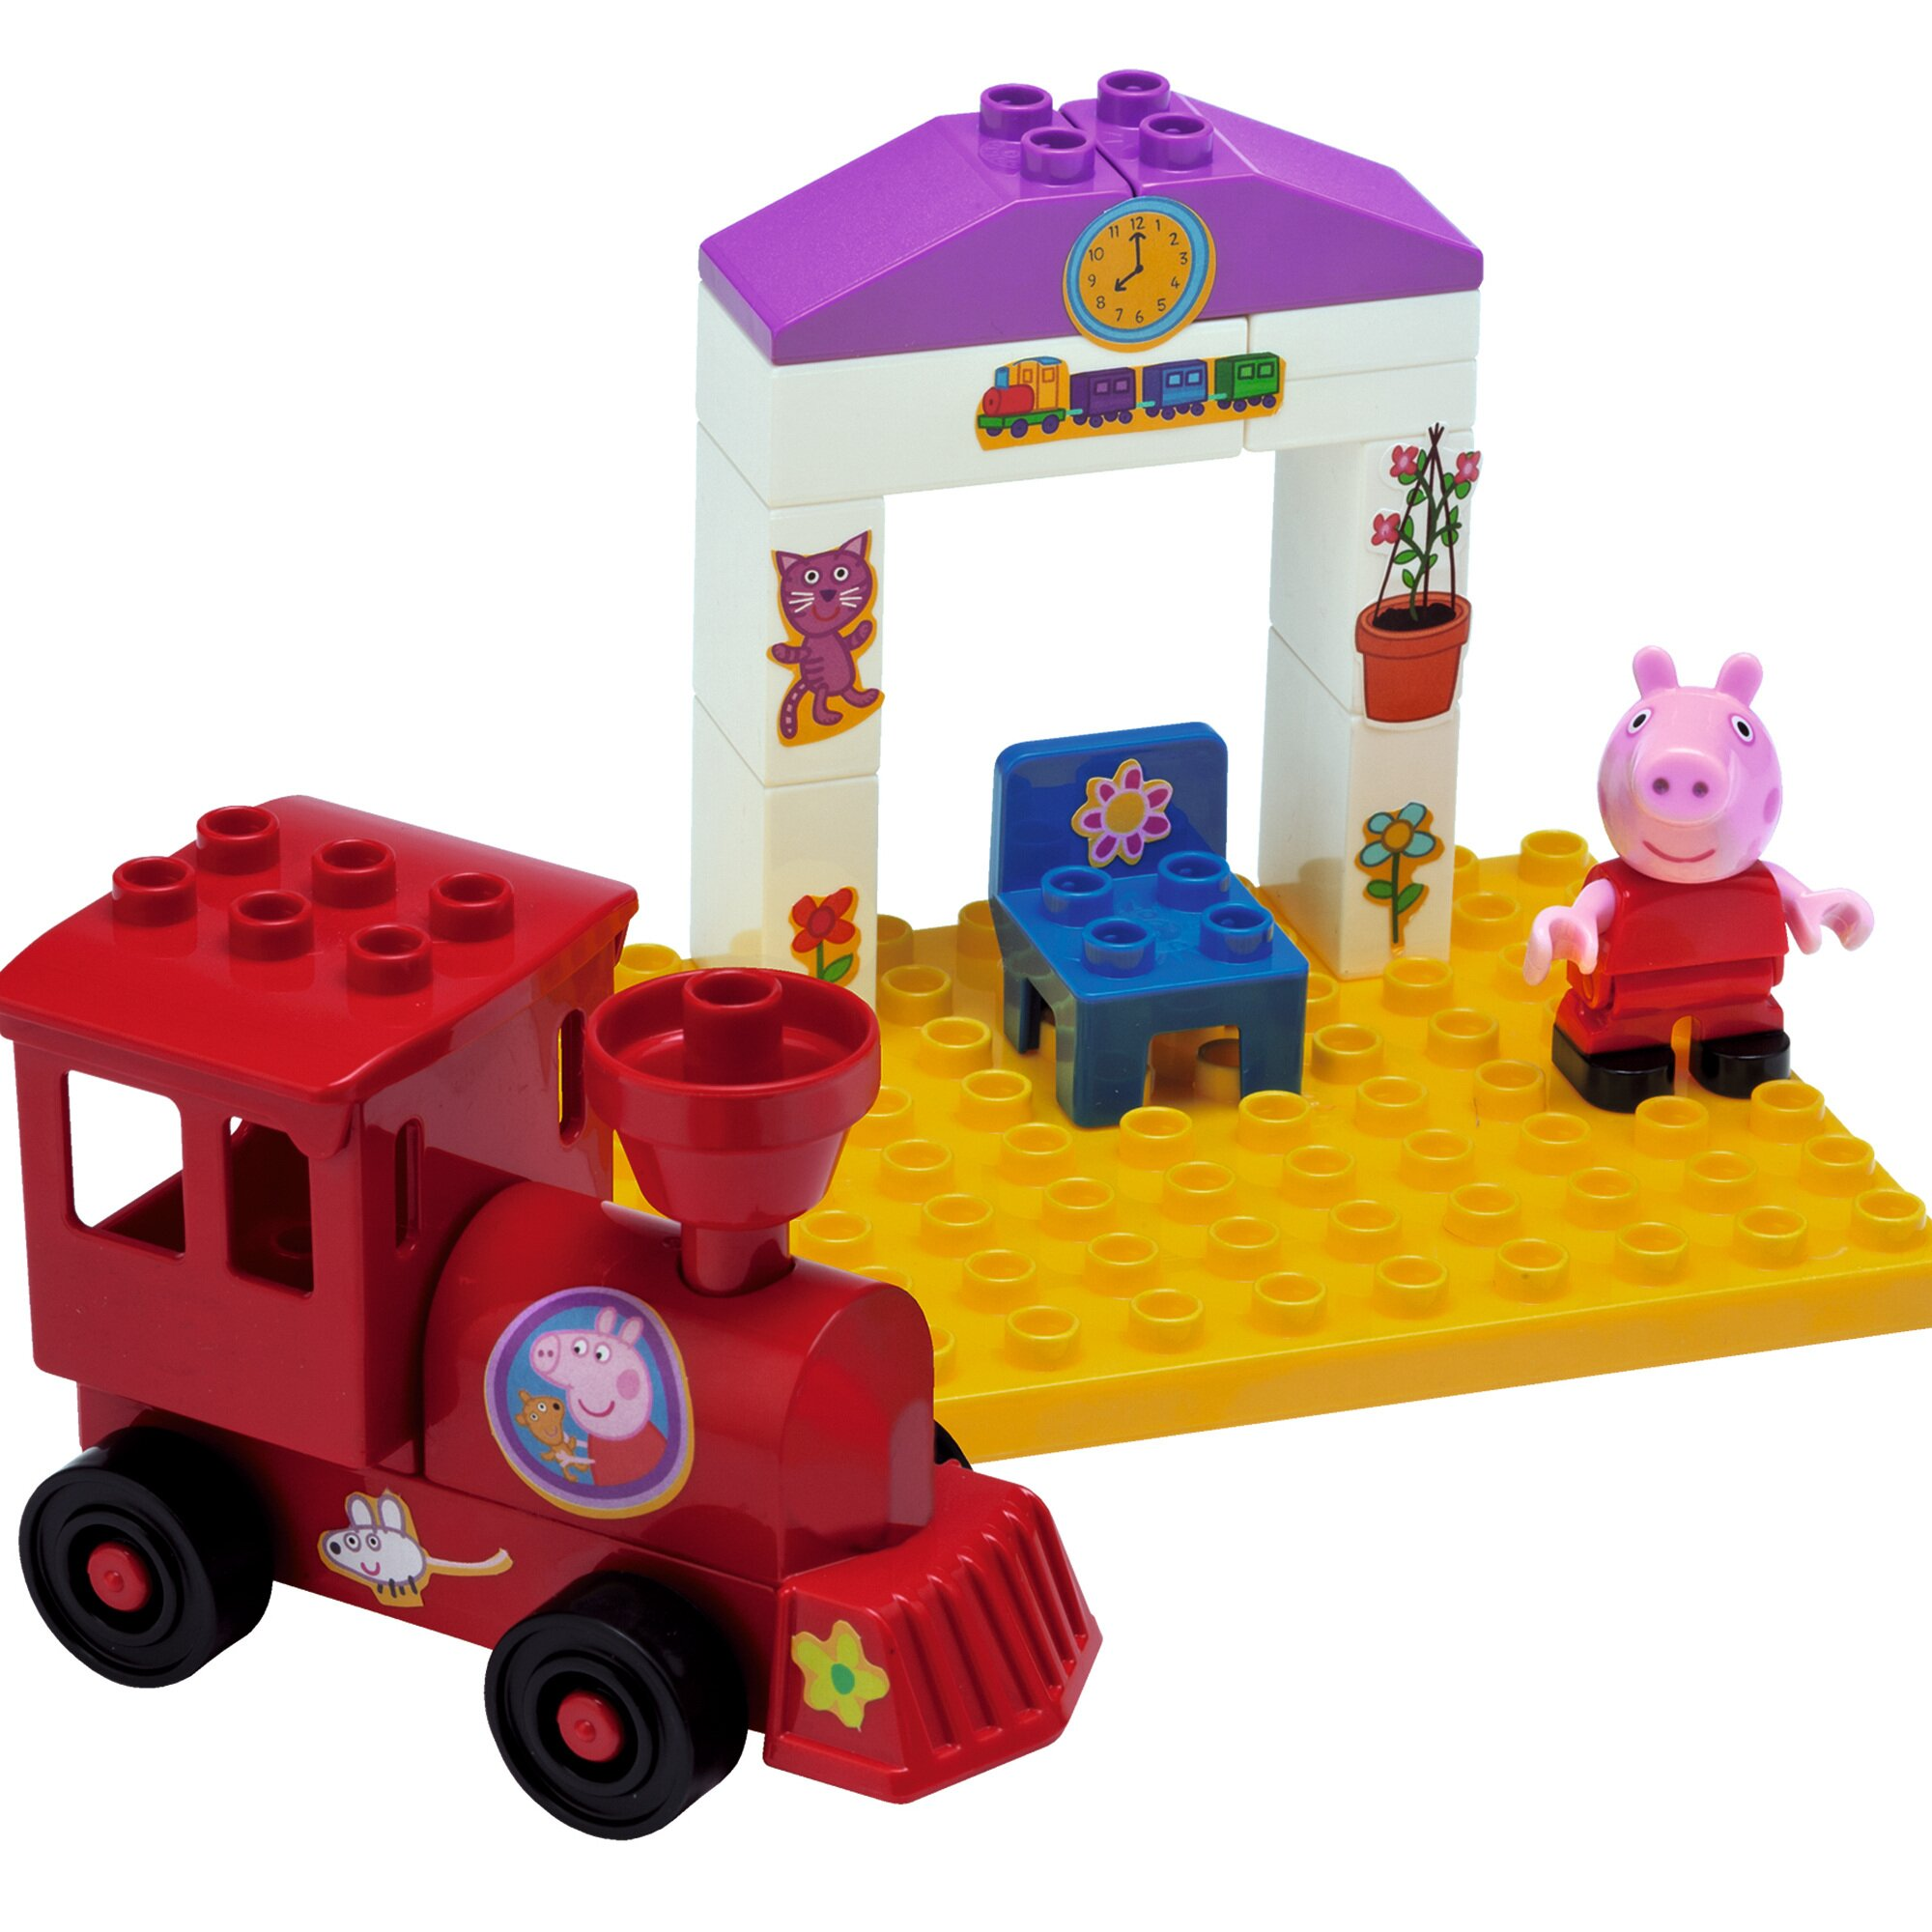 Bloxx Baustein-Set Peppa Pig Bahnhof